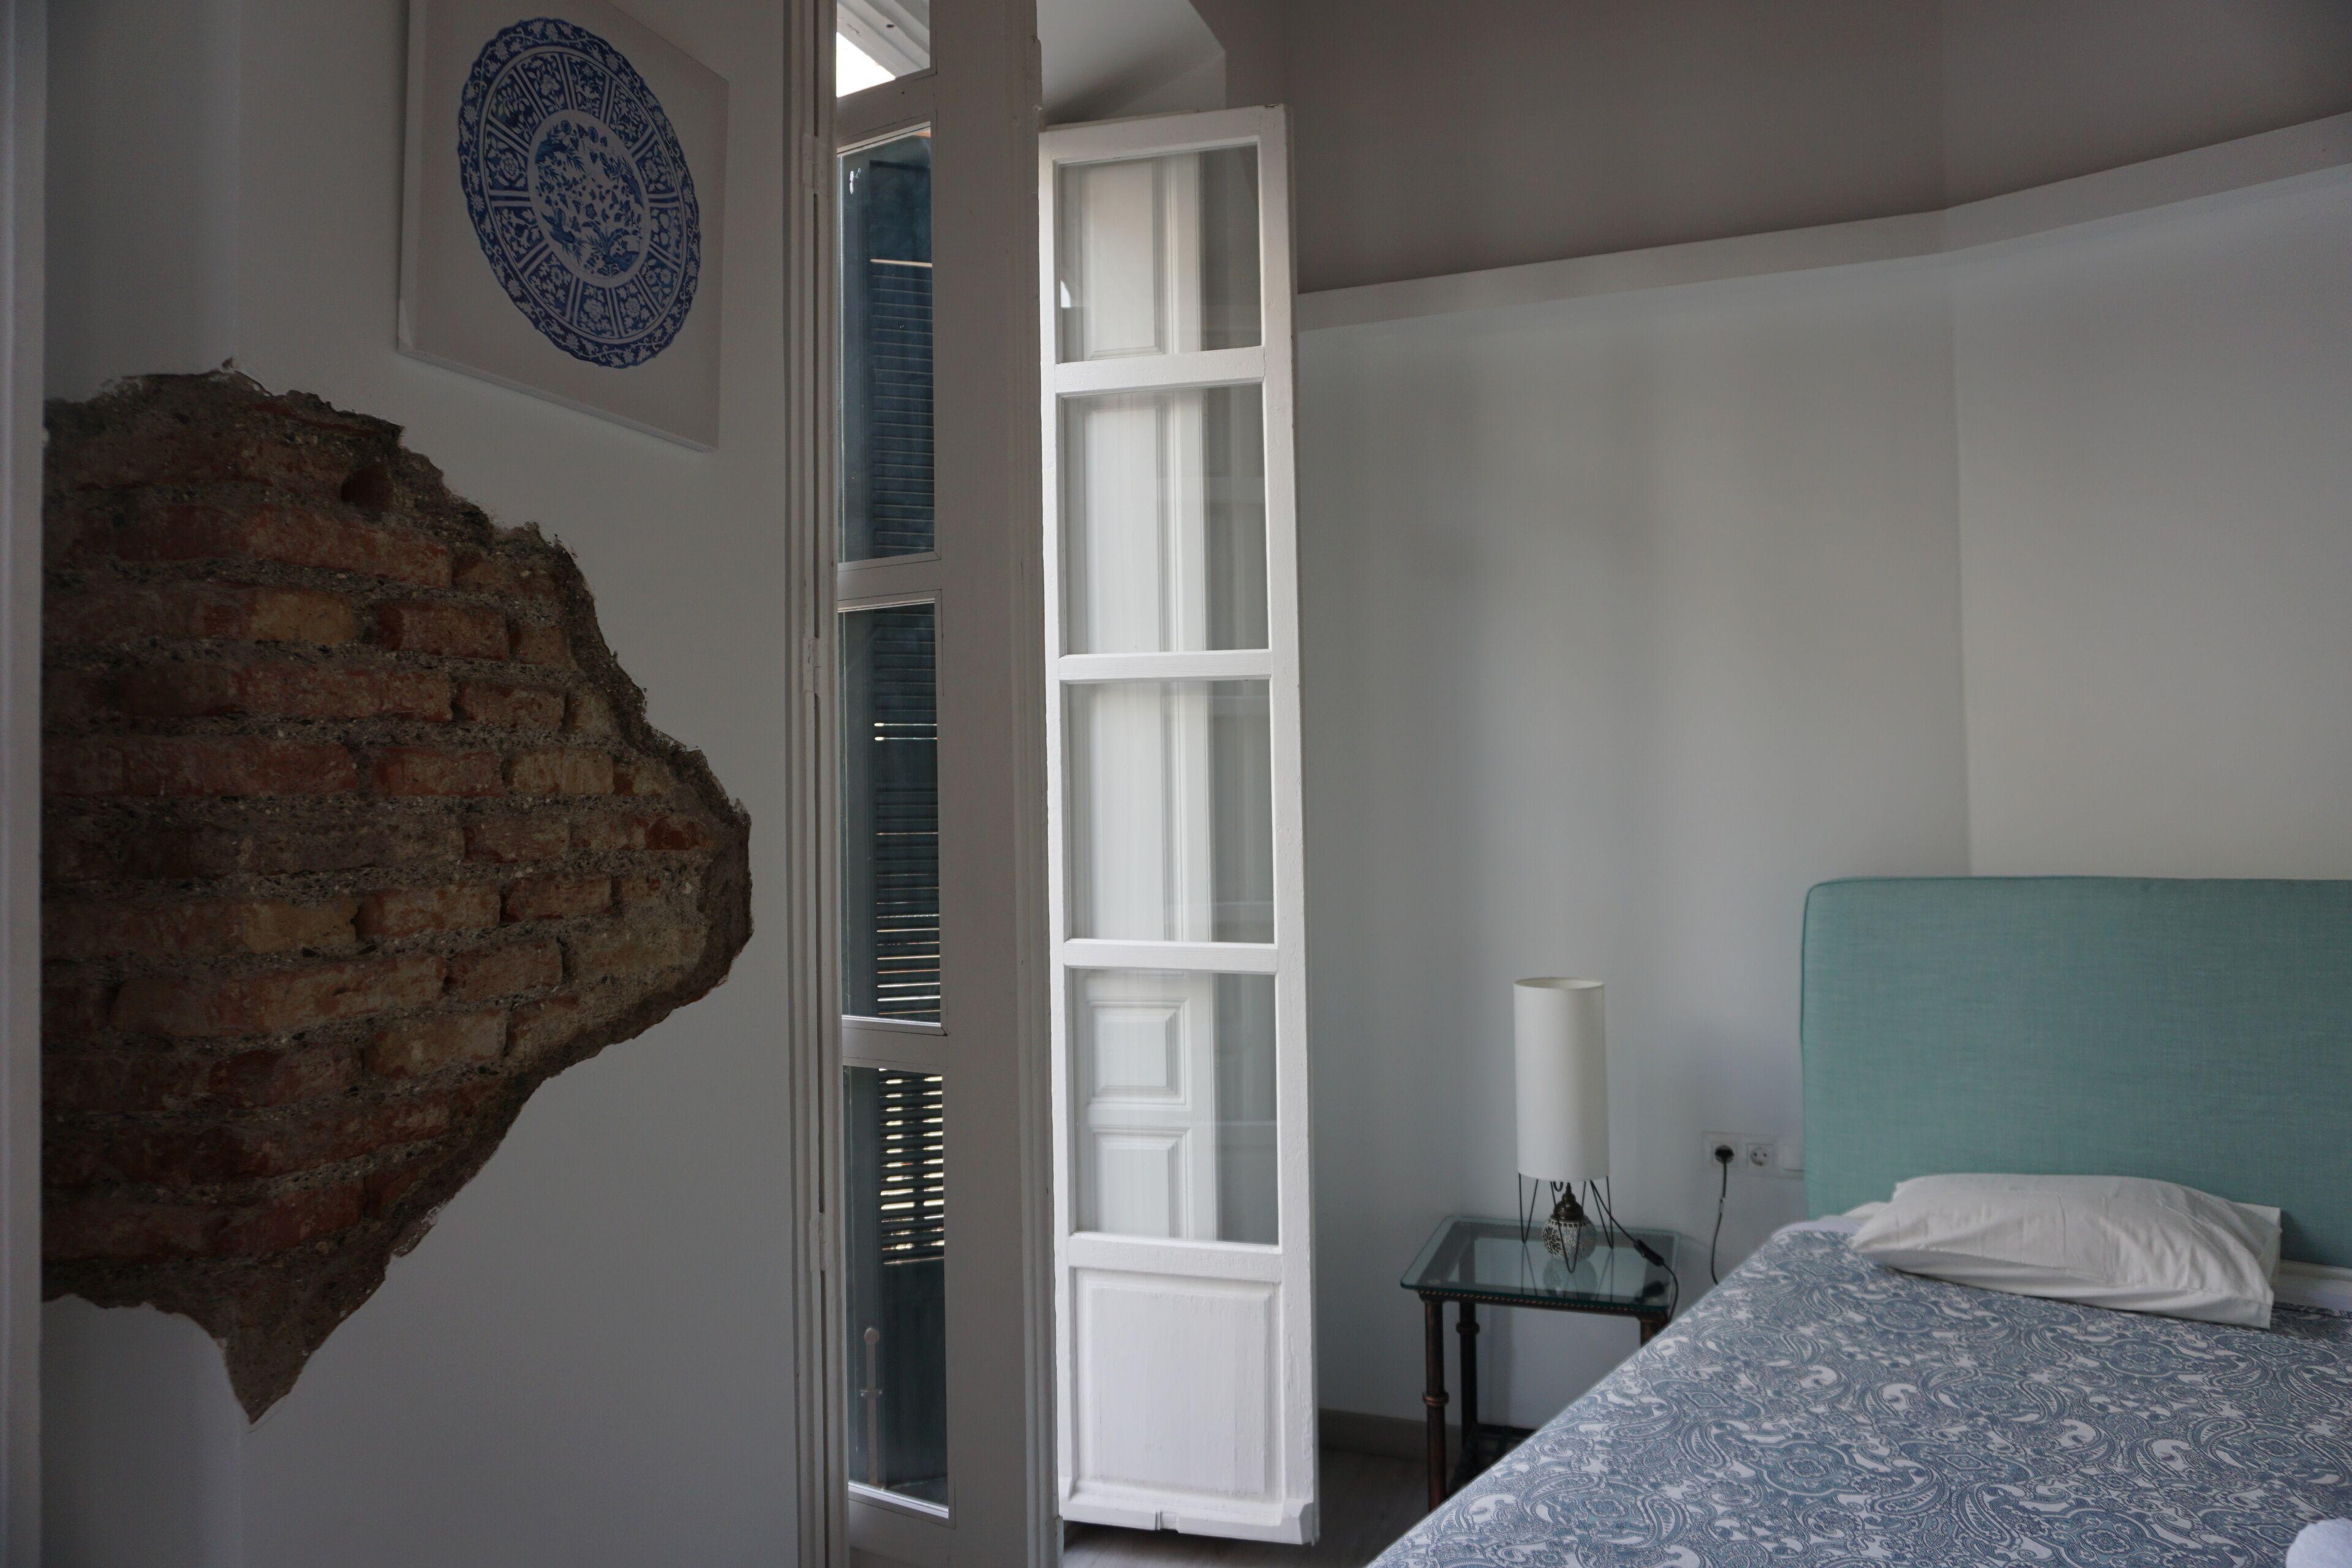 Courtesy of Apartamentos Mediterraneo Centro / Expedia